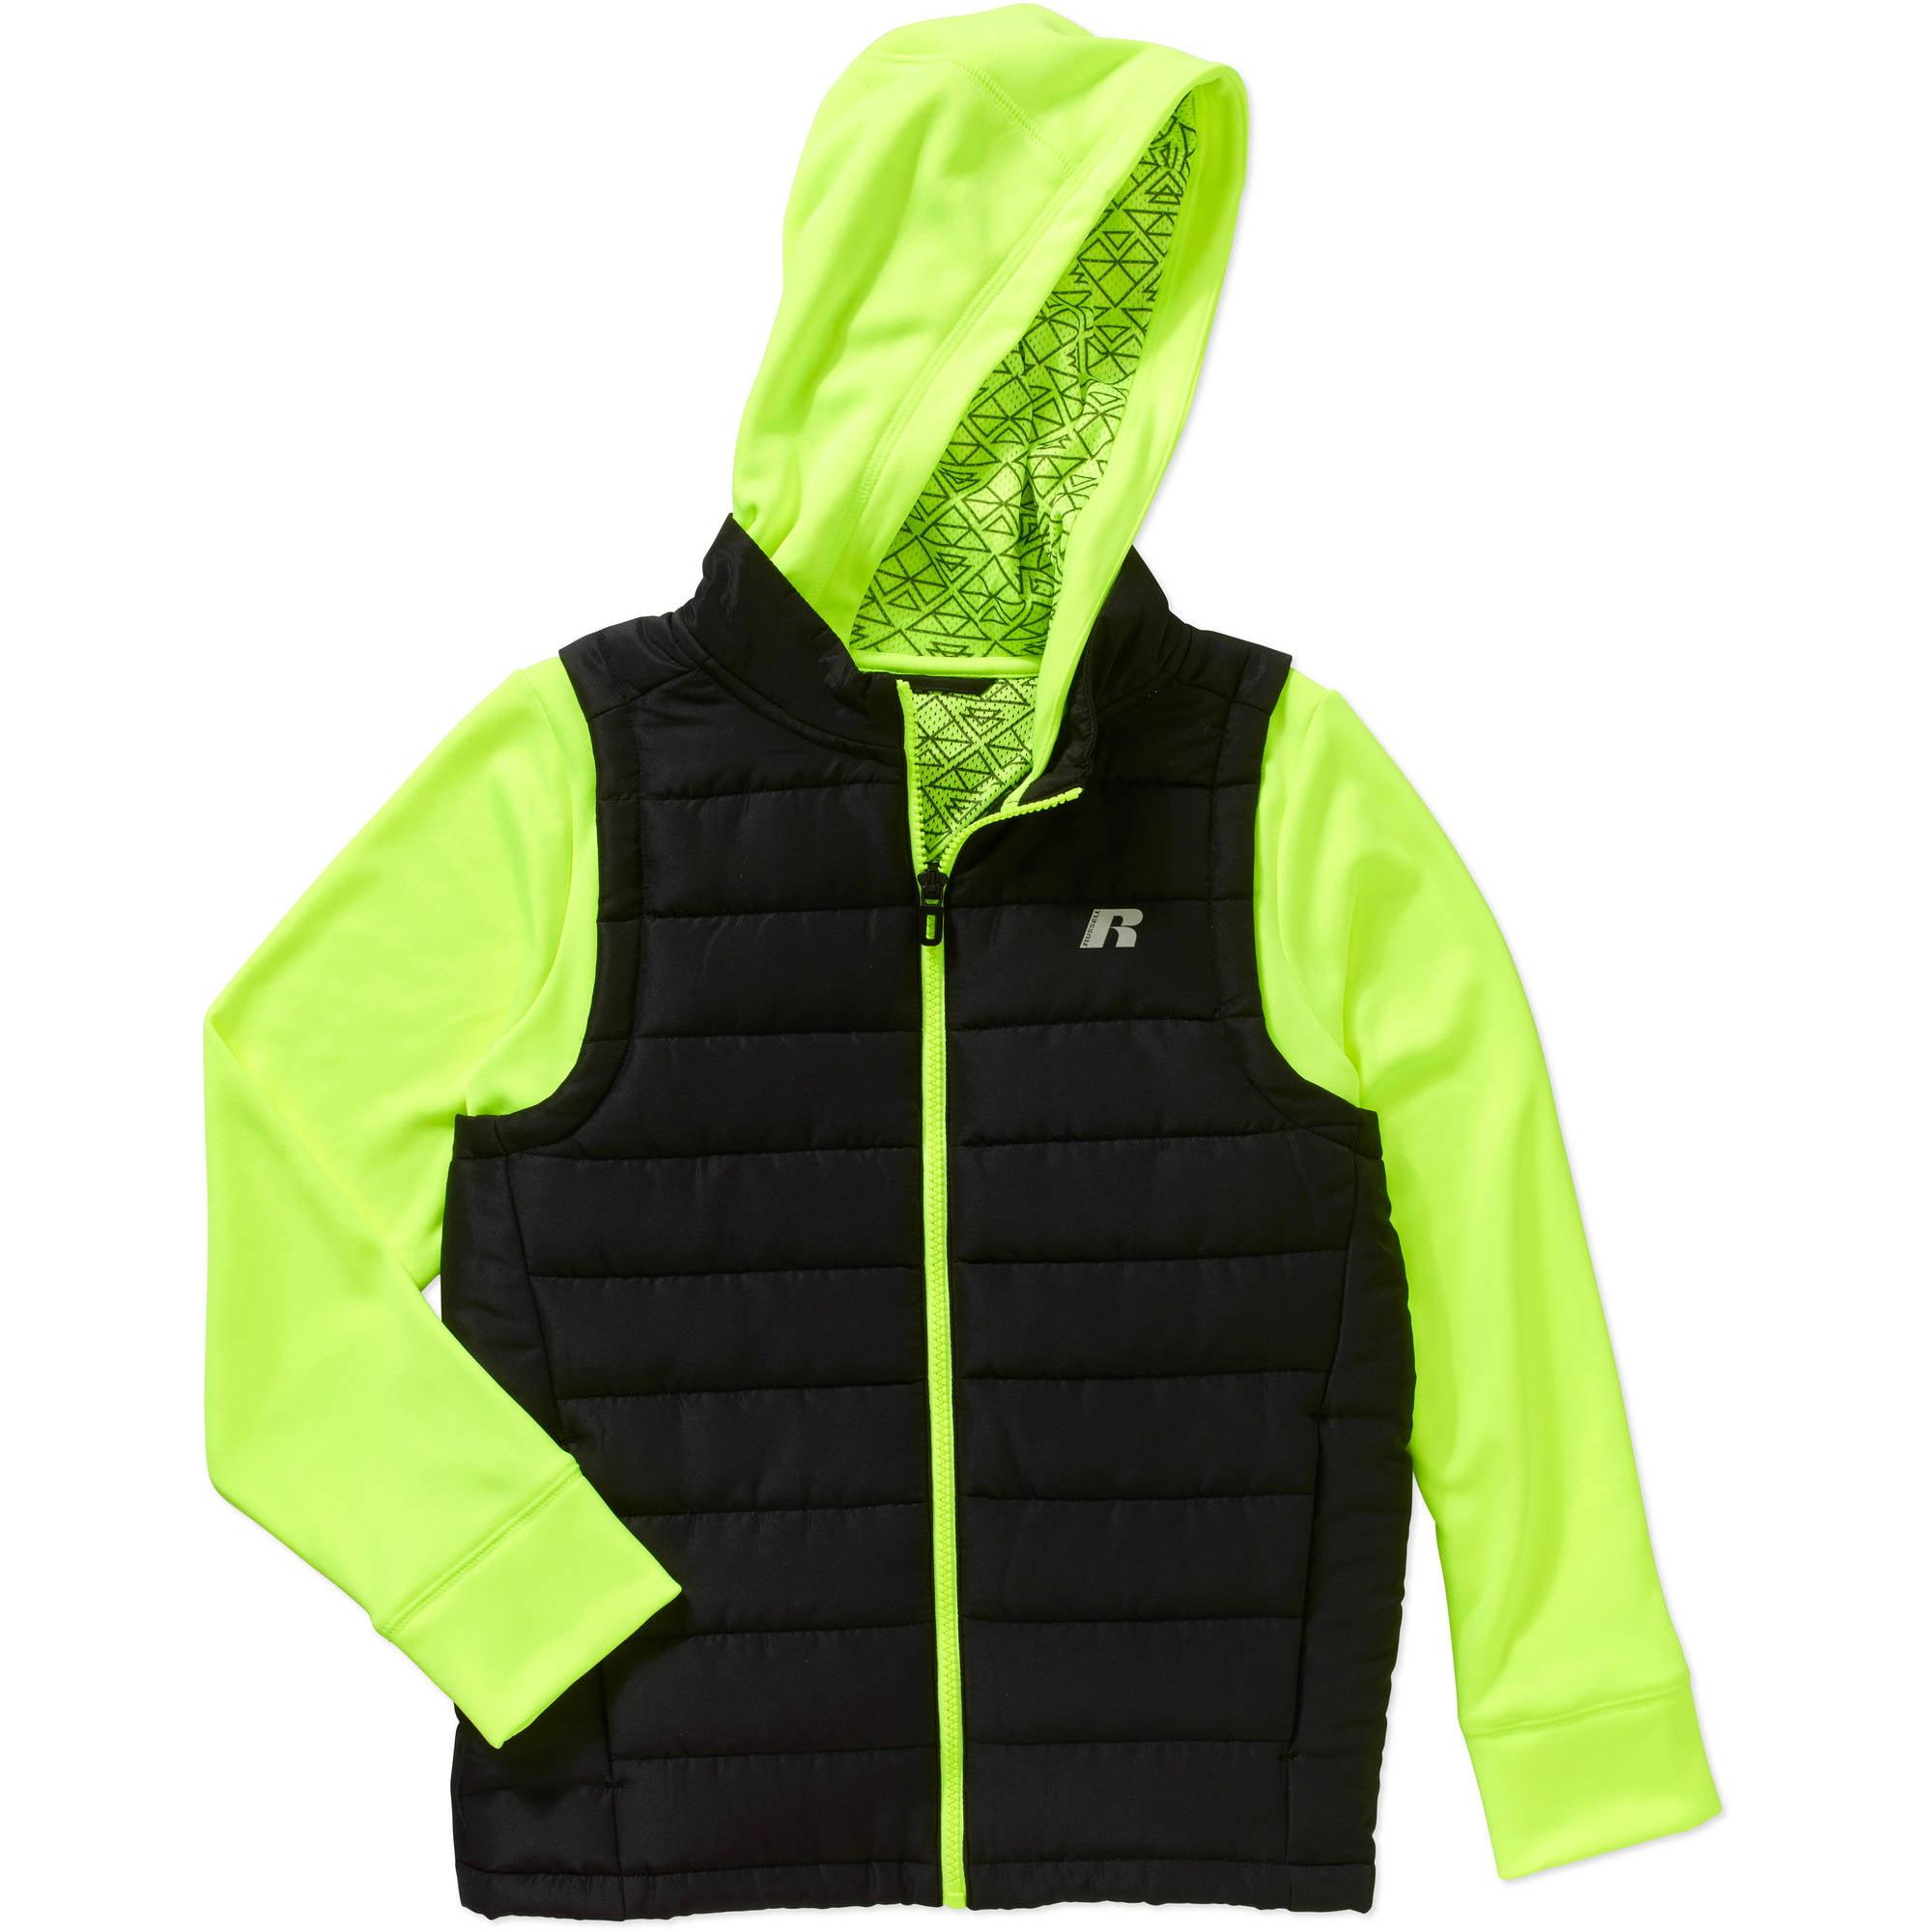 5117cc9c6a7 Russell Sweatshirts Walmart